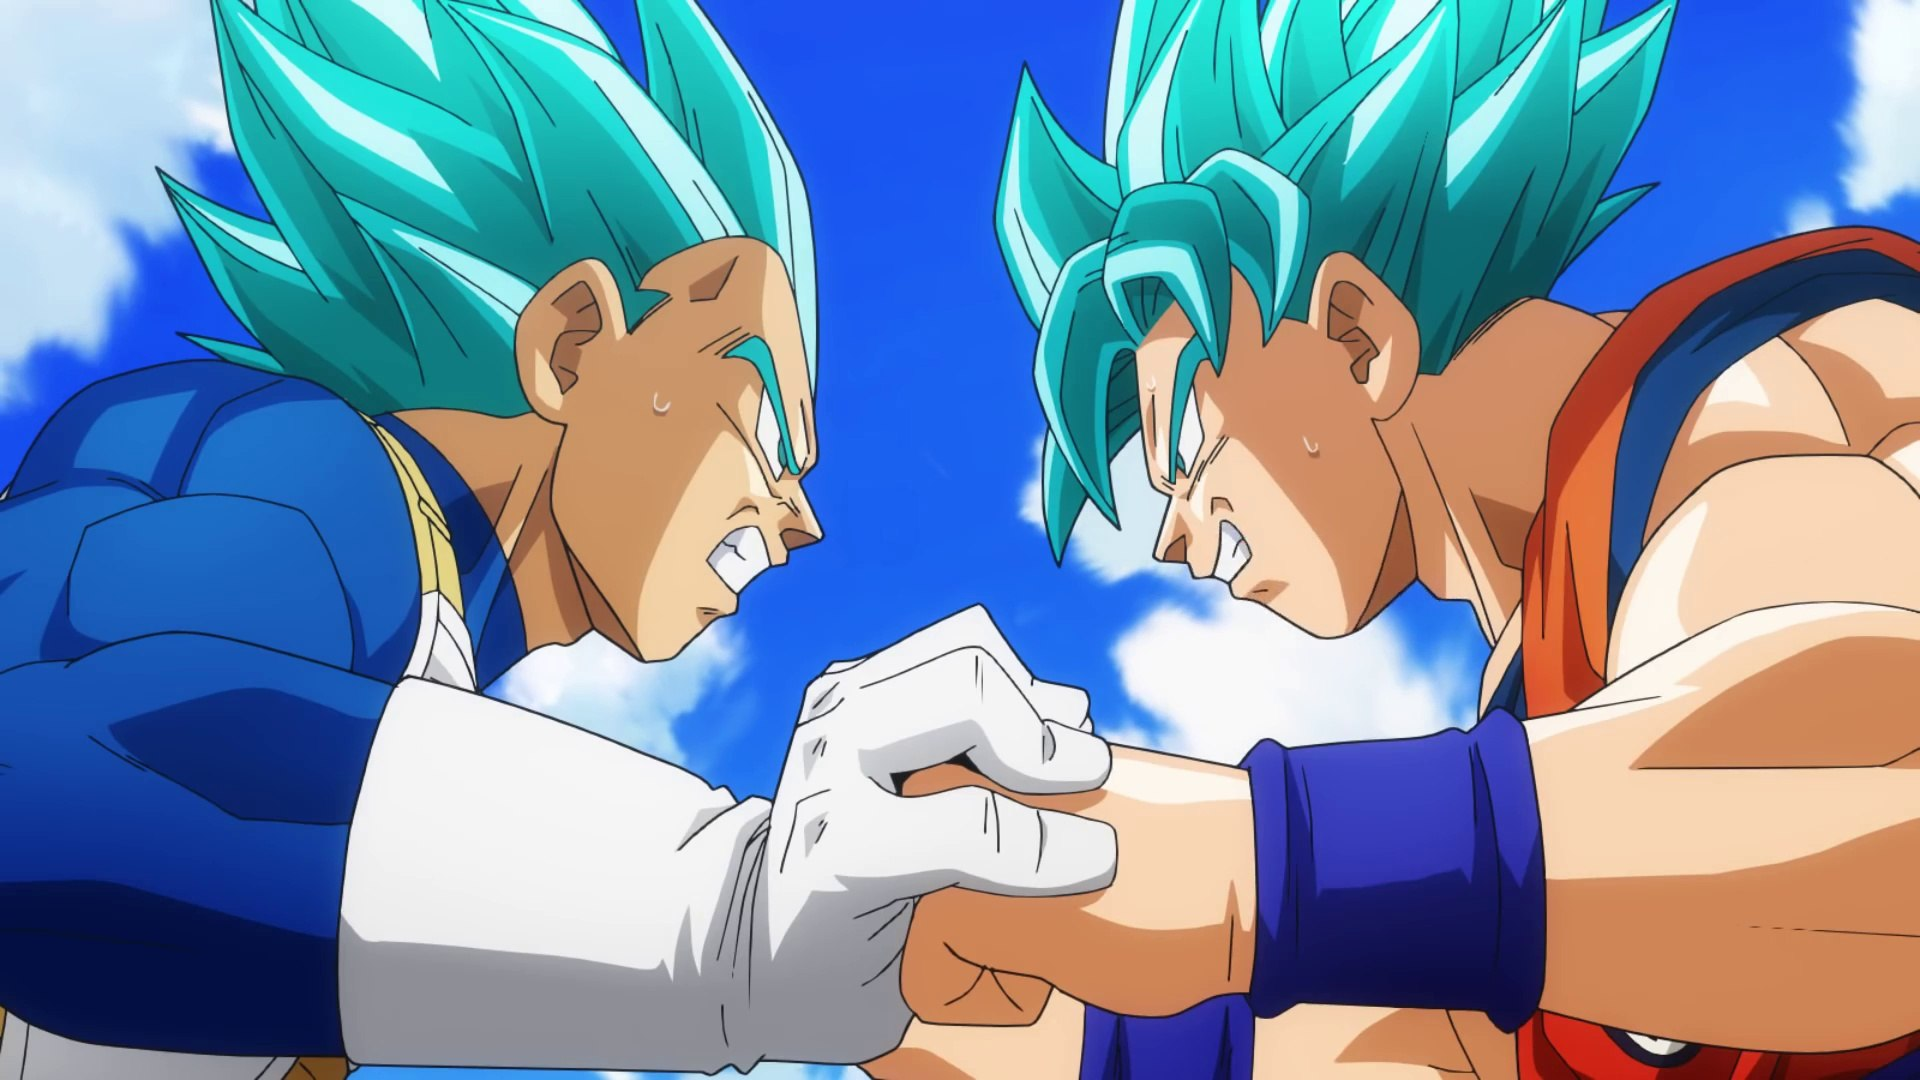 Goku đấu với Vegeta